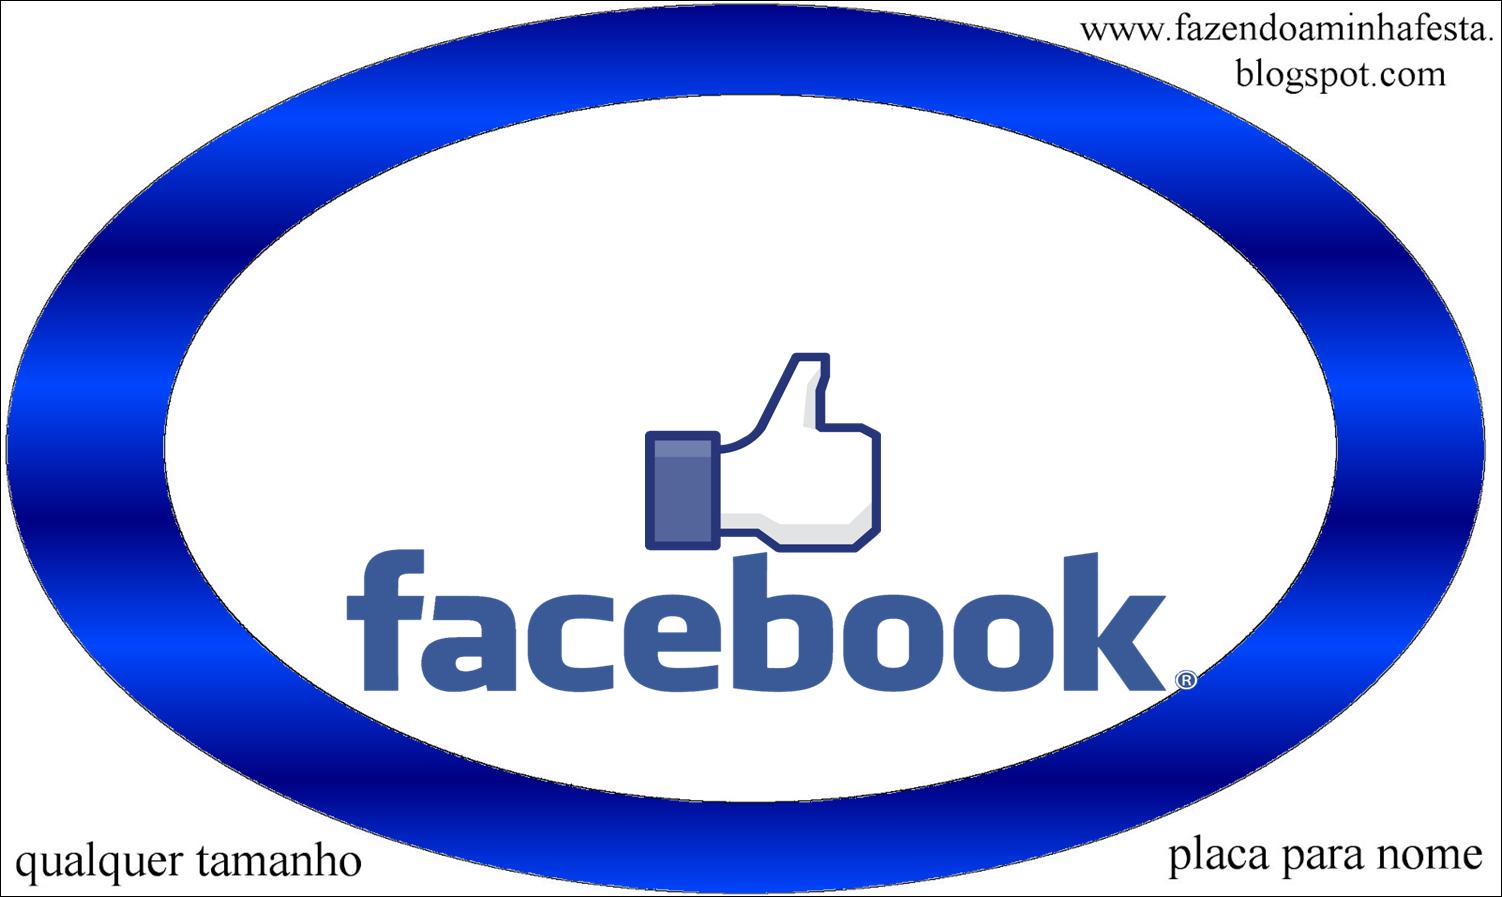 Amiga do facebook no banheiro facebook friend the bathroom 5